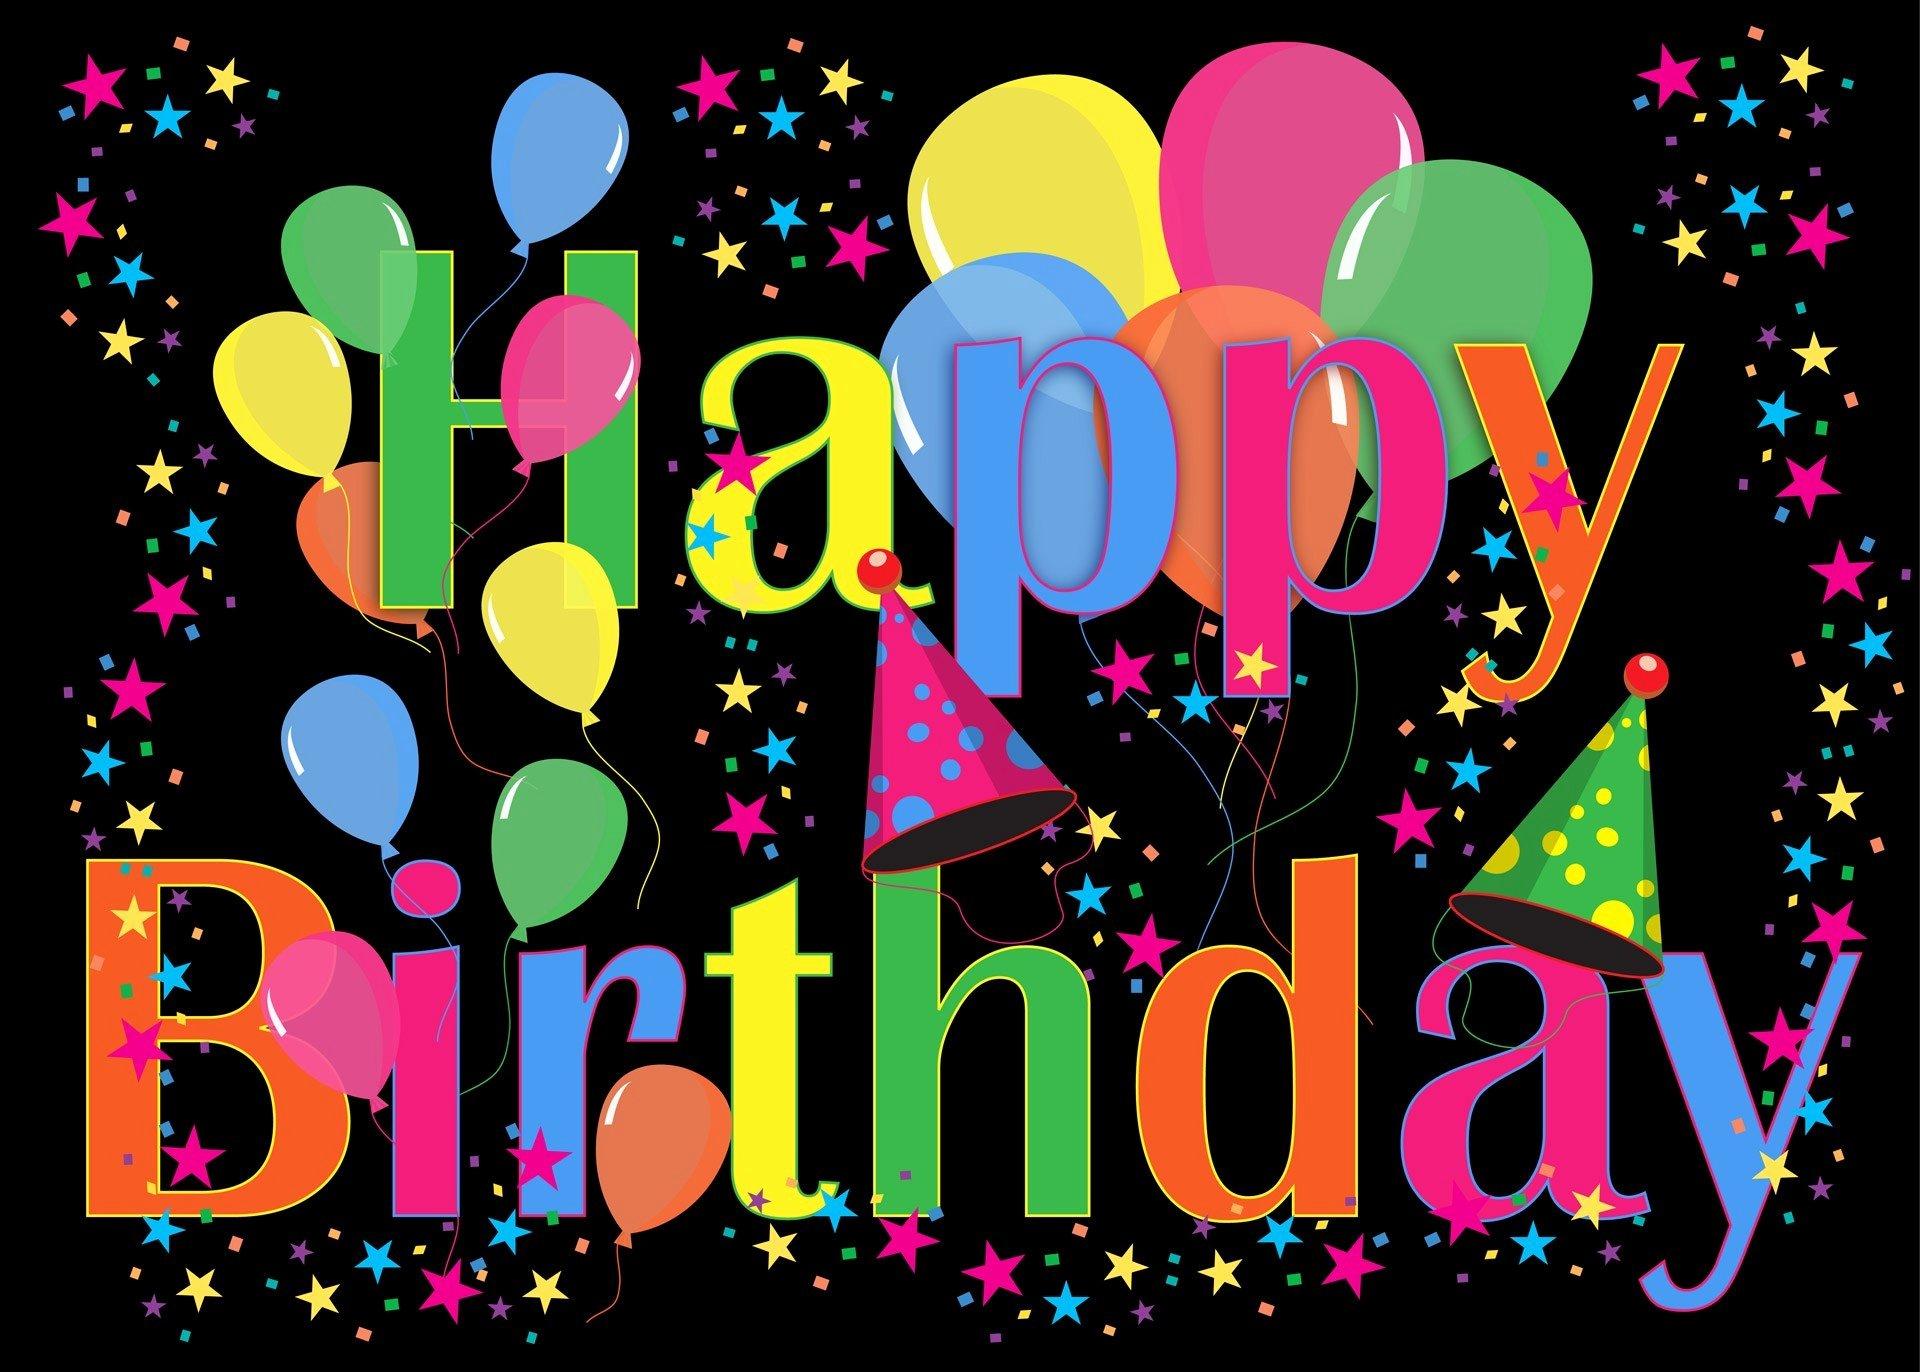 Happy Bday Wallpapers Free Best Of Happy Birthday Desktop Wallpaper ·① Wallpapertag